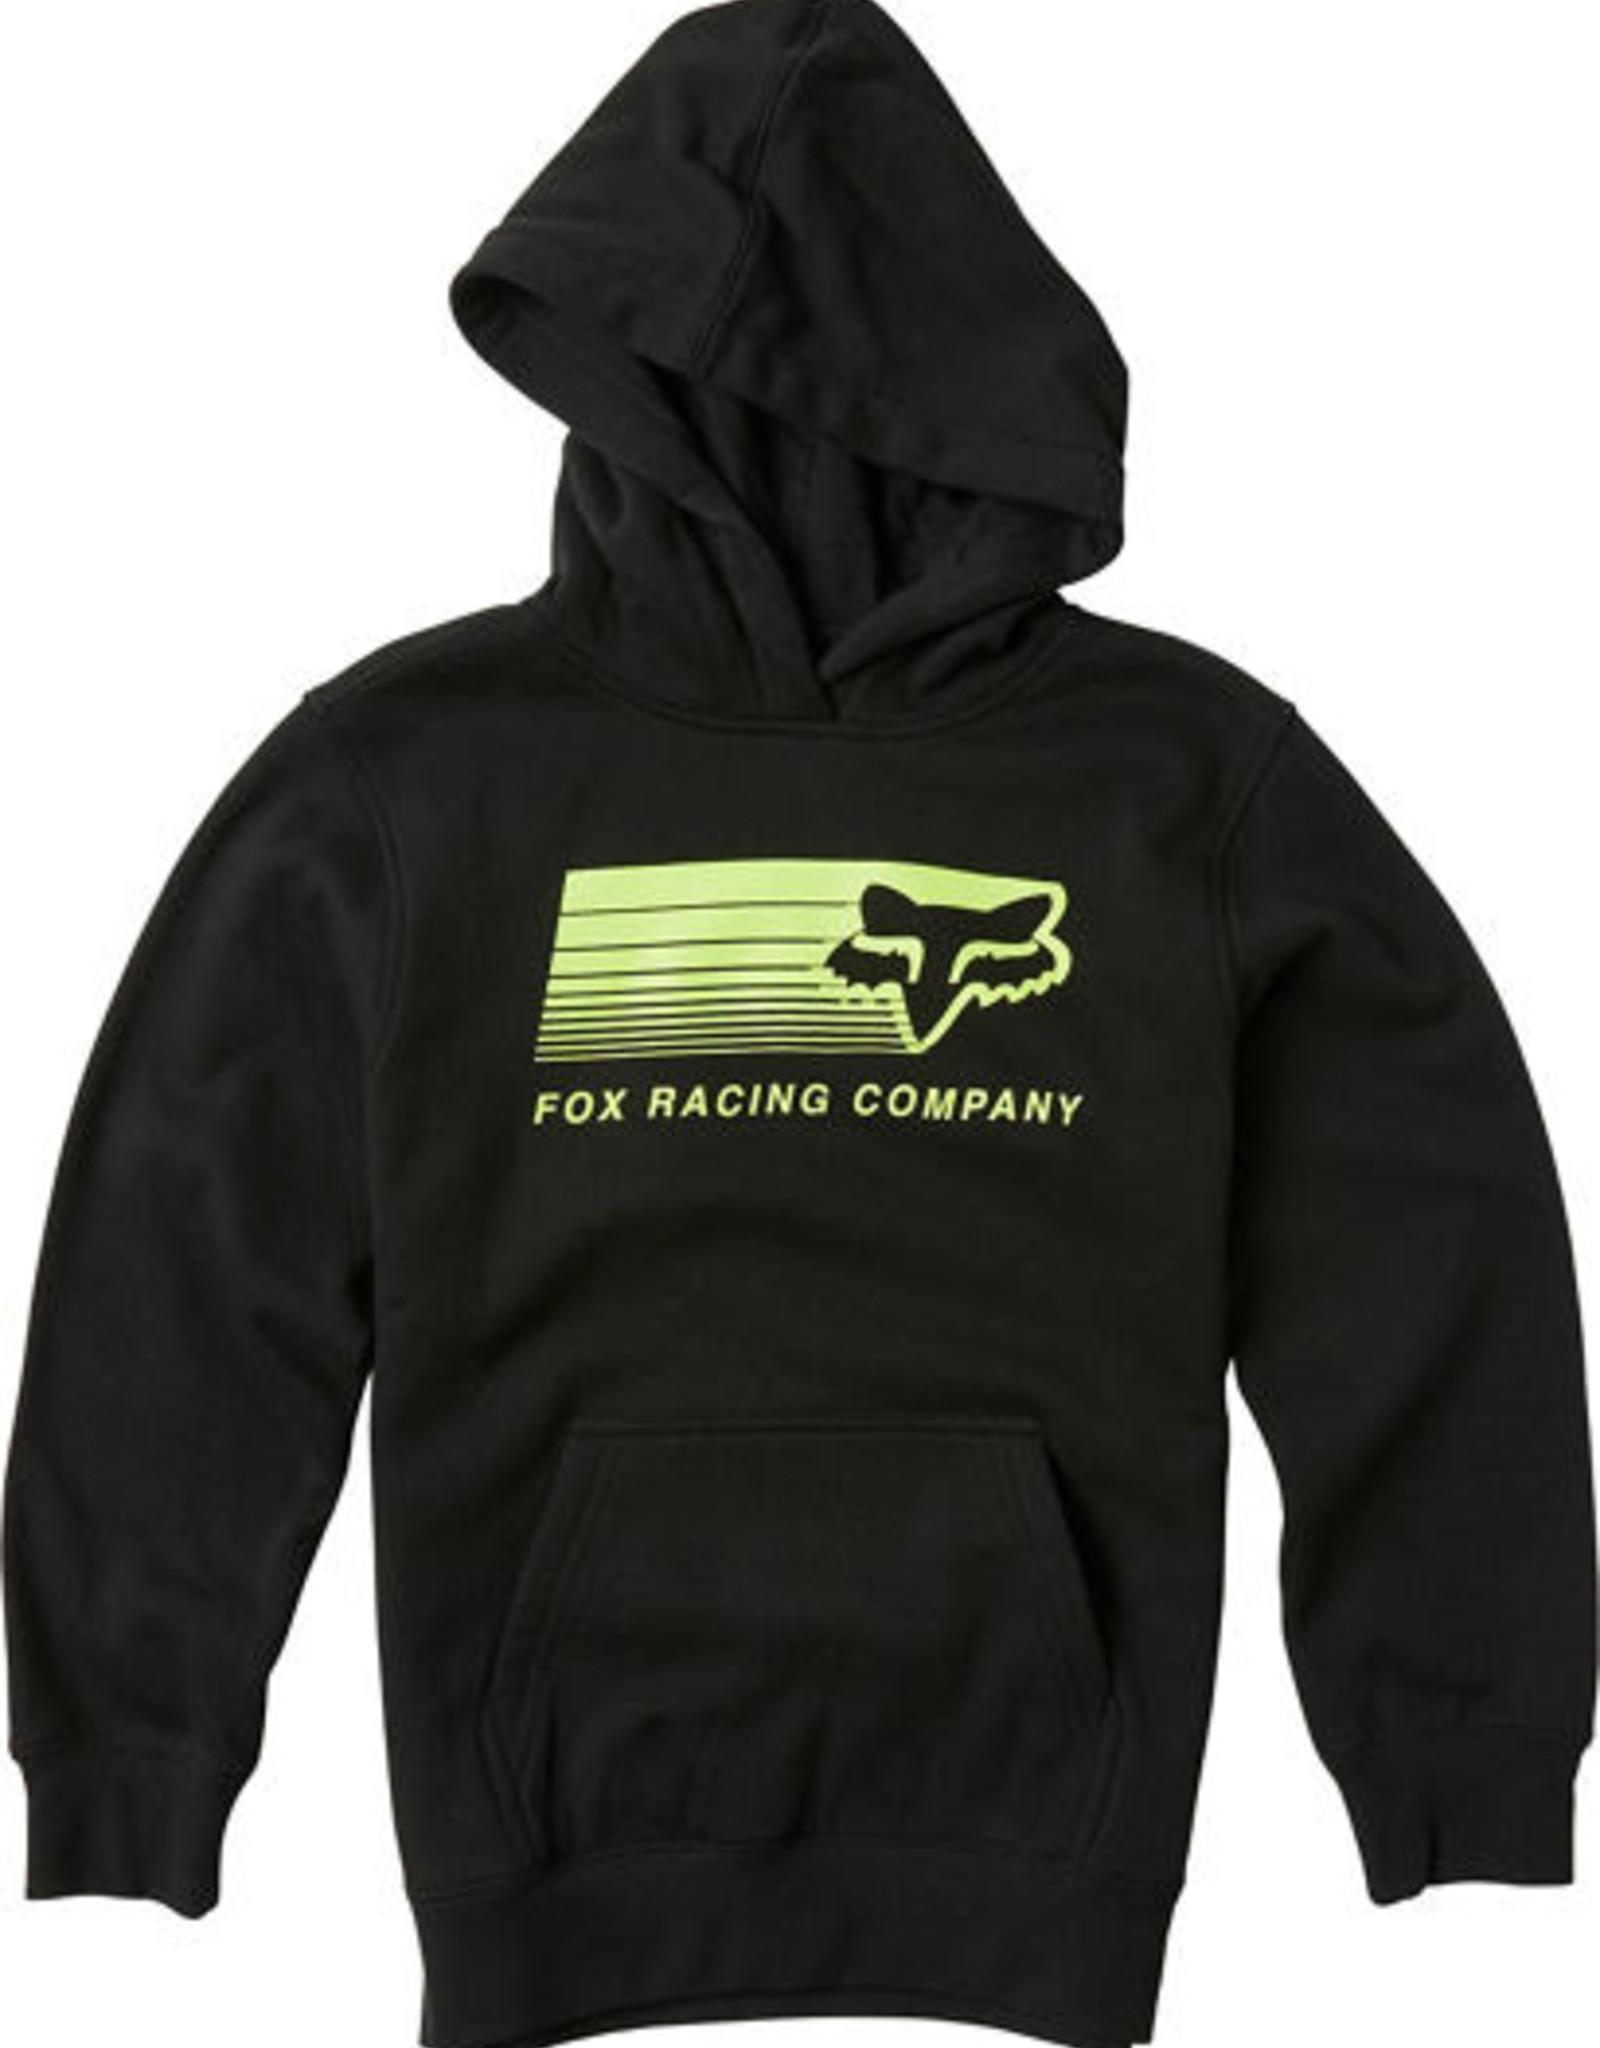 FOX Drifter Pull Over Hoodie - Black